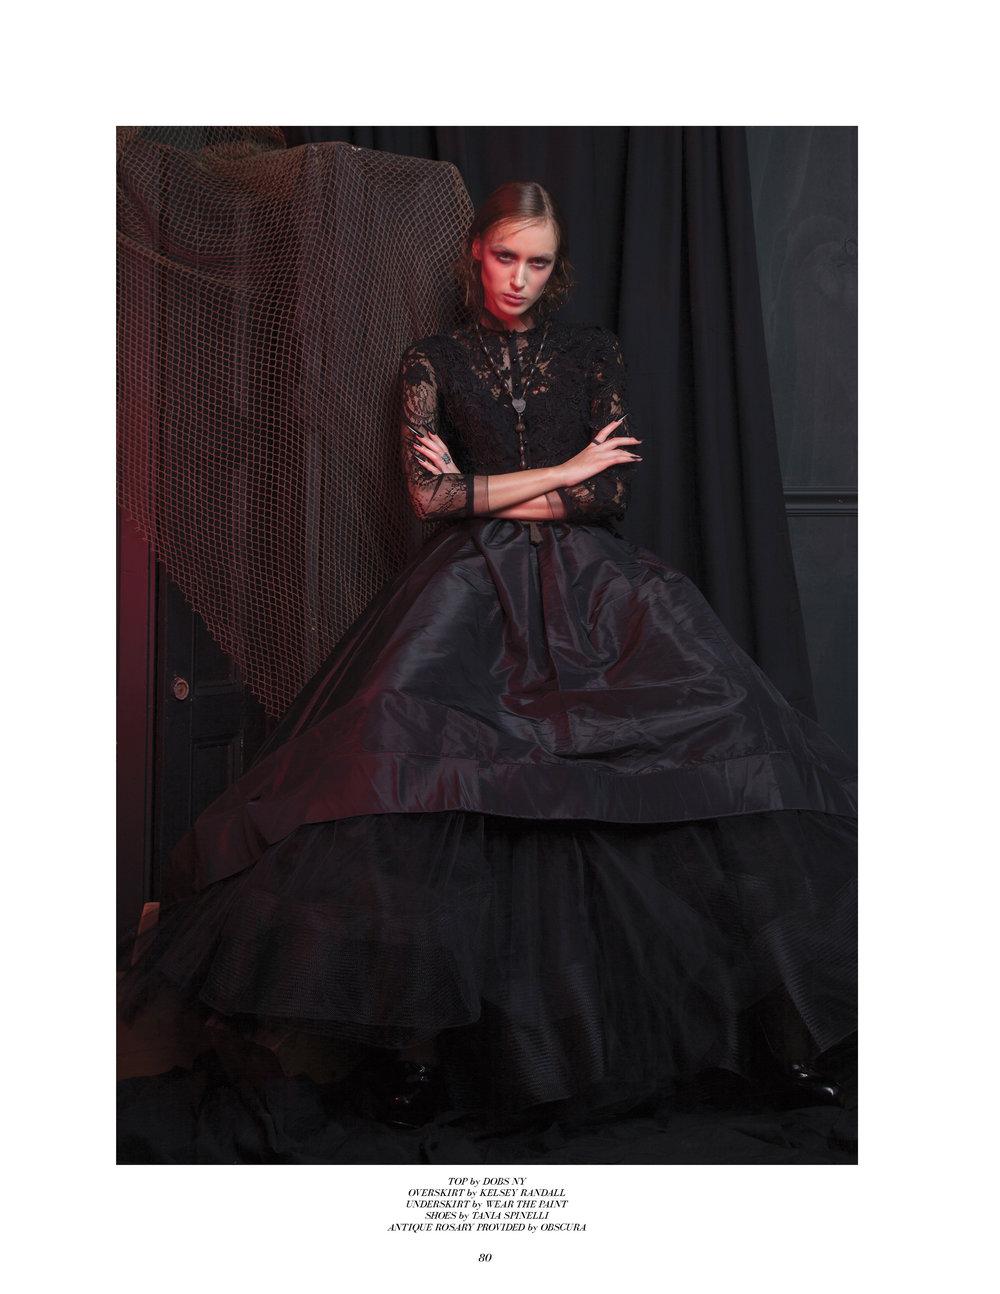 kelsey randall emerging designer made-to-measure fashion editorial custom bespoke black silk taffeta gown gathered waist wishbone racer back horsehair full skirt